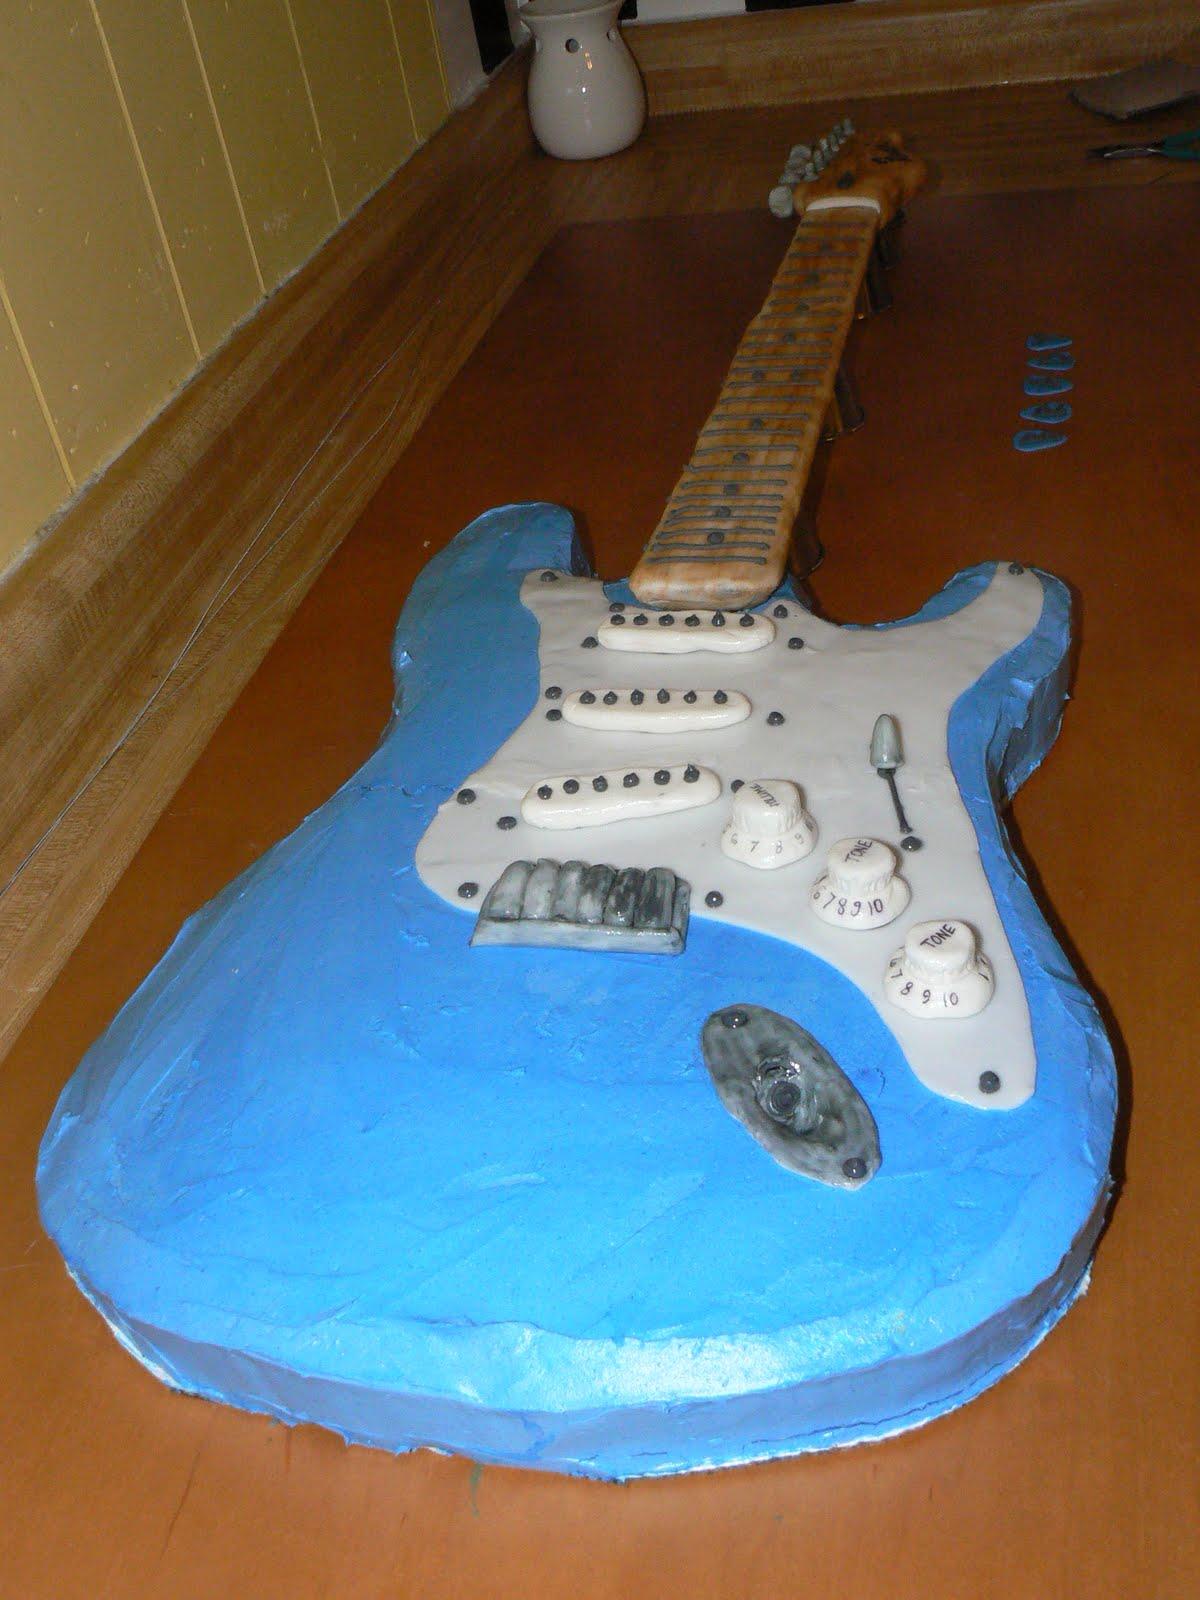 Bake Lore: The Fender Stratocaster - - of Cake